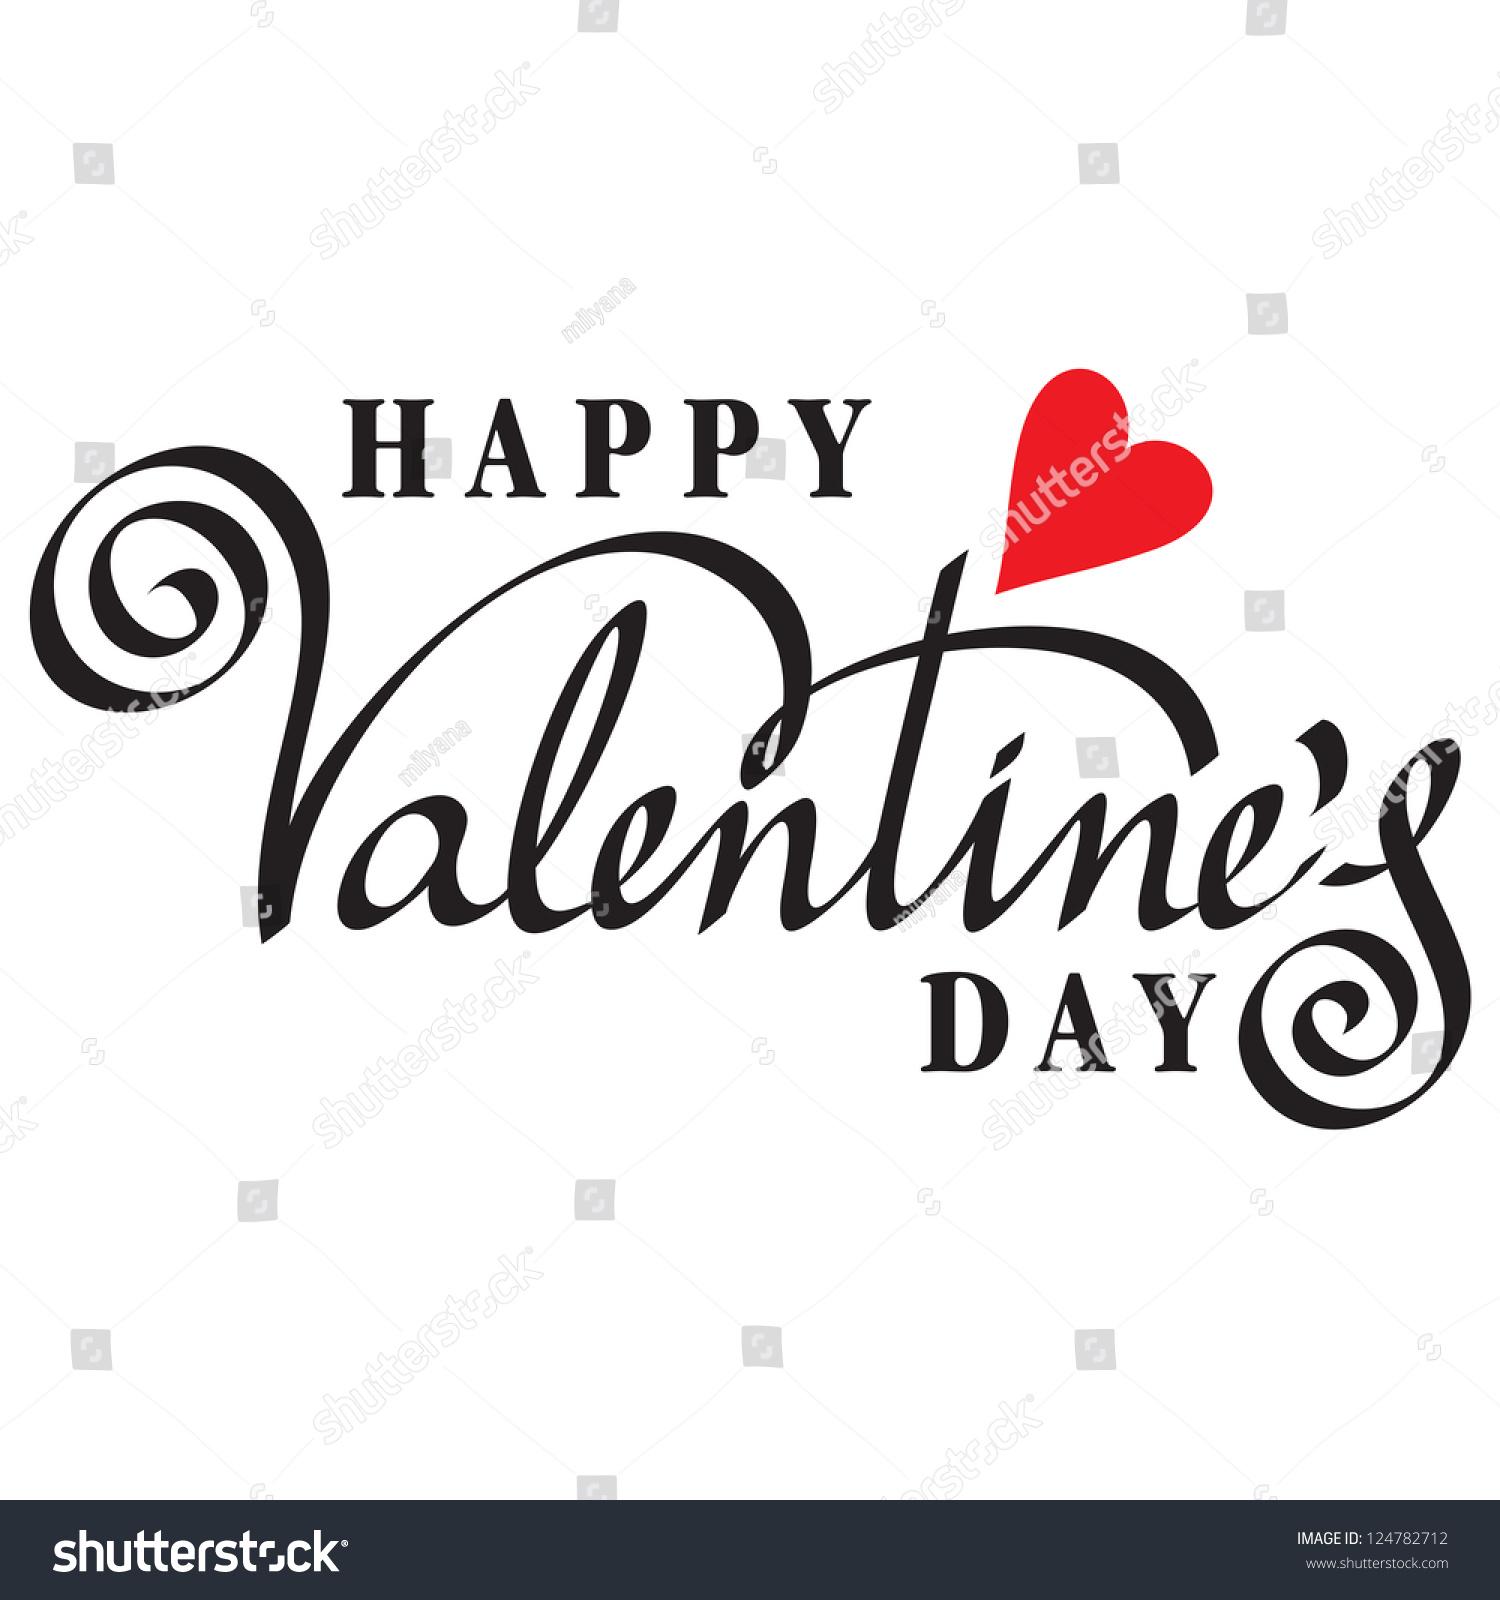 Happy valentine s day hand lettering handmade